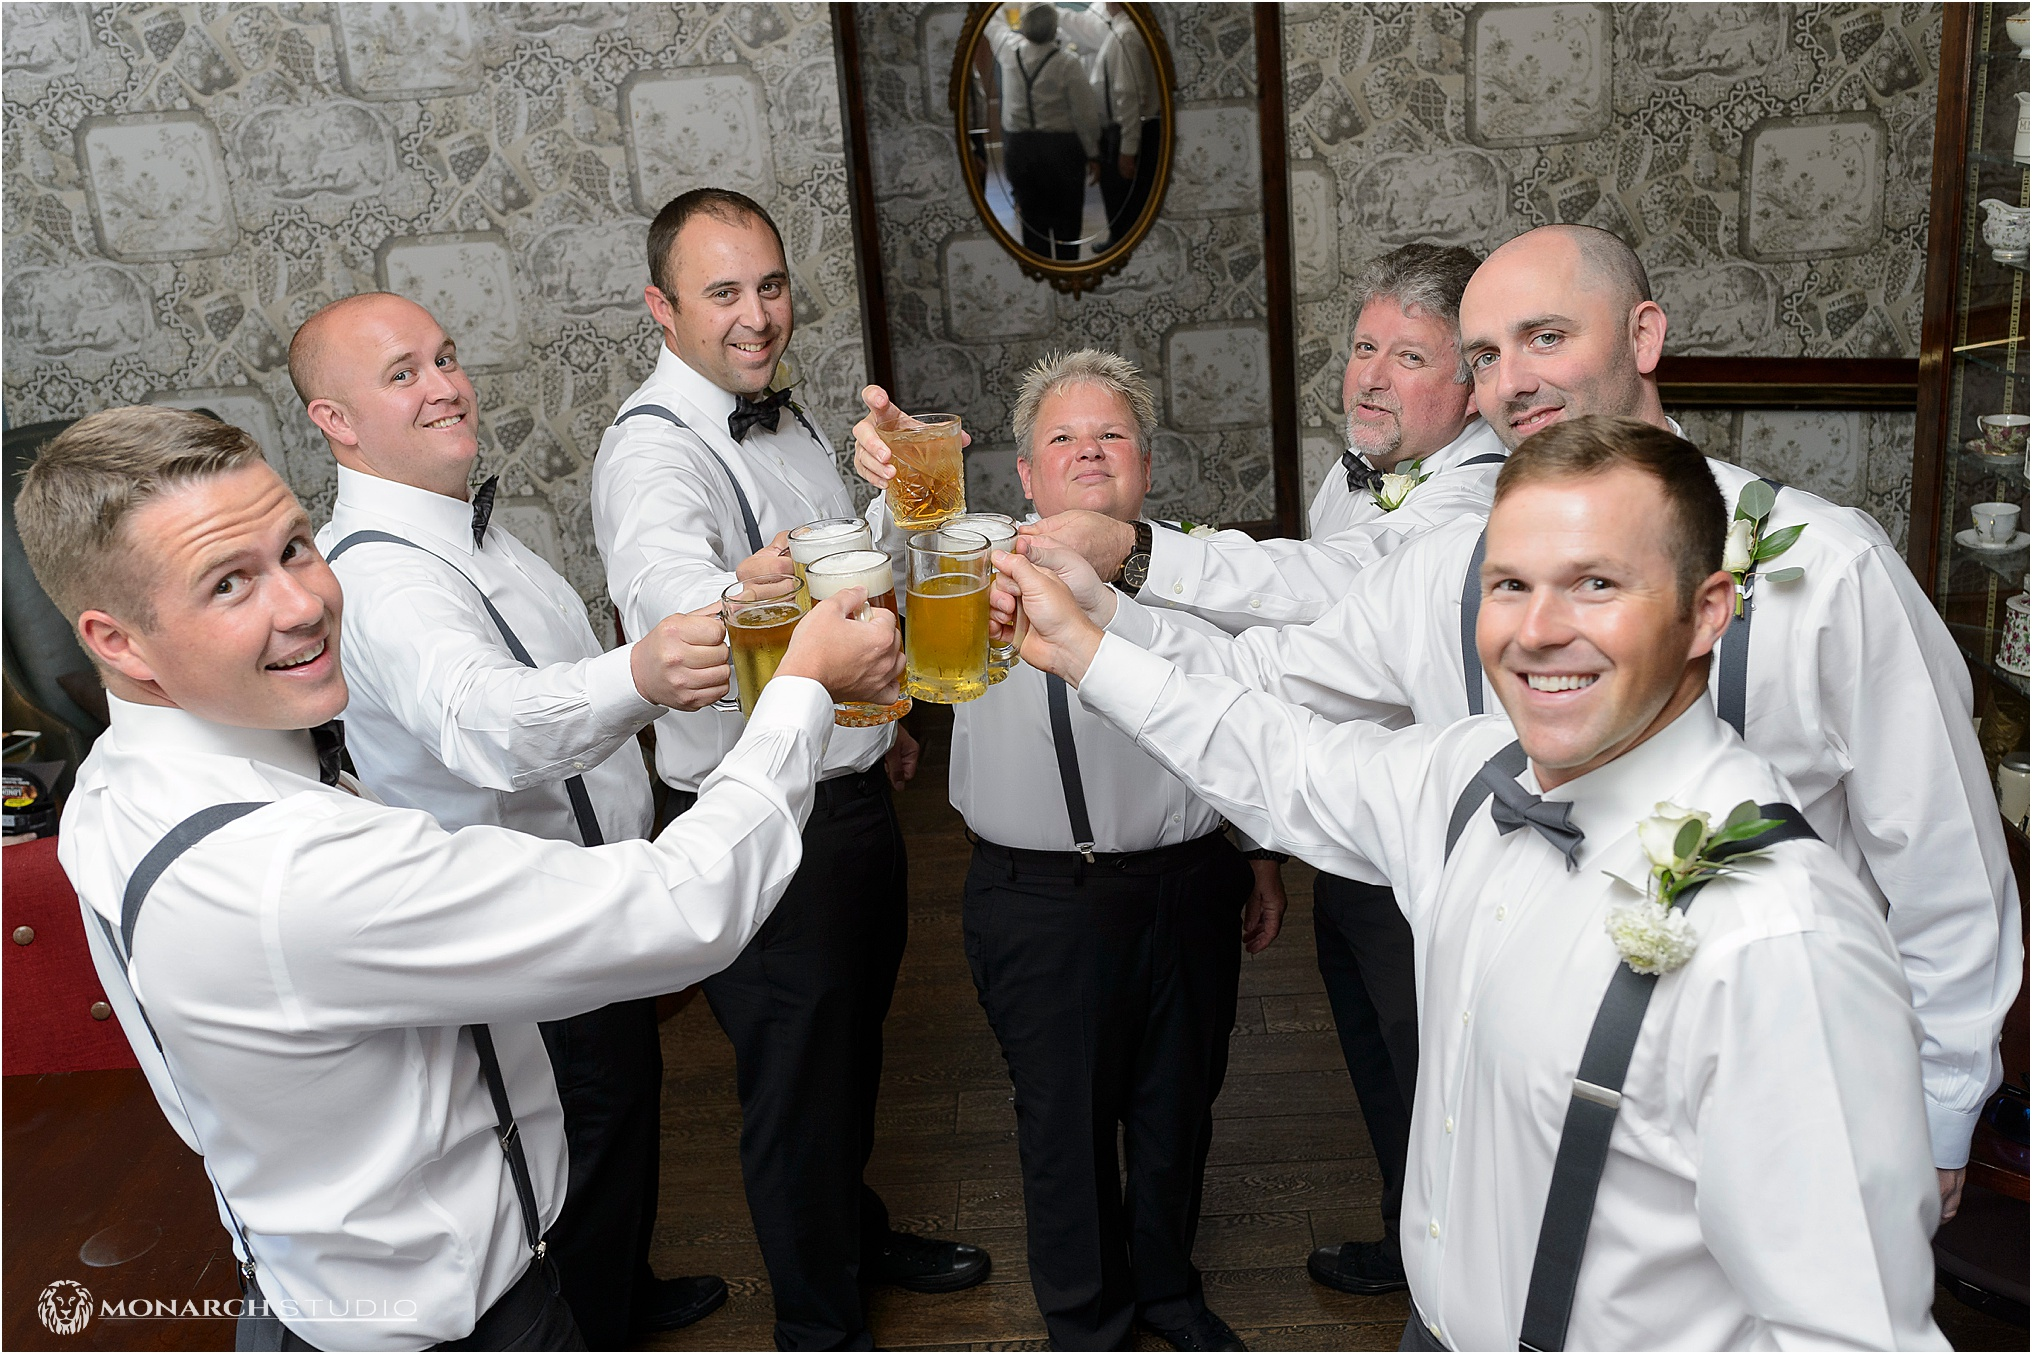 031-whiteroom-wedding-photographer-2019-05-22_0013.jpg